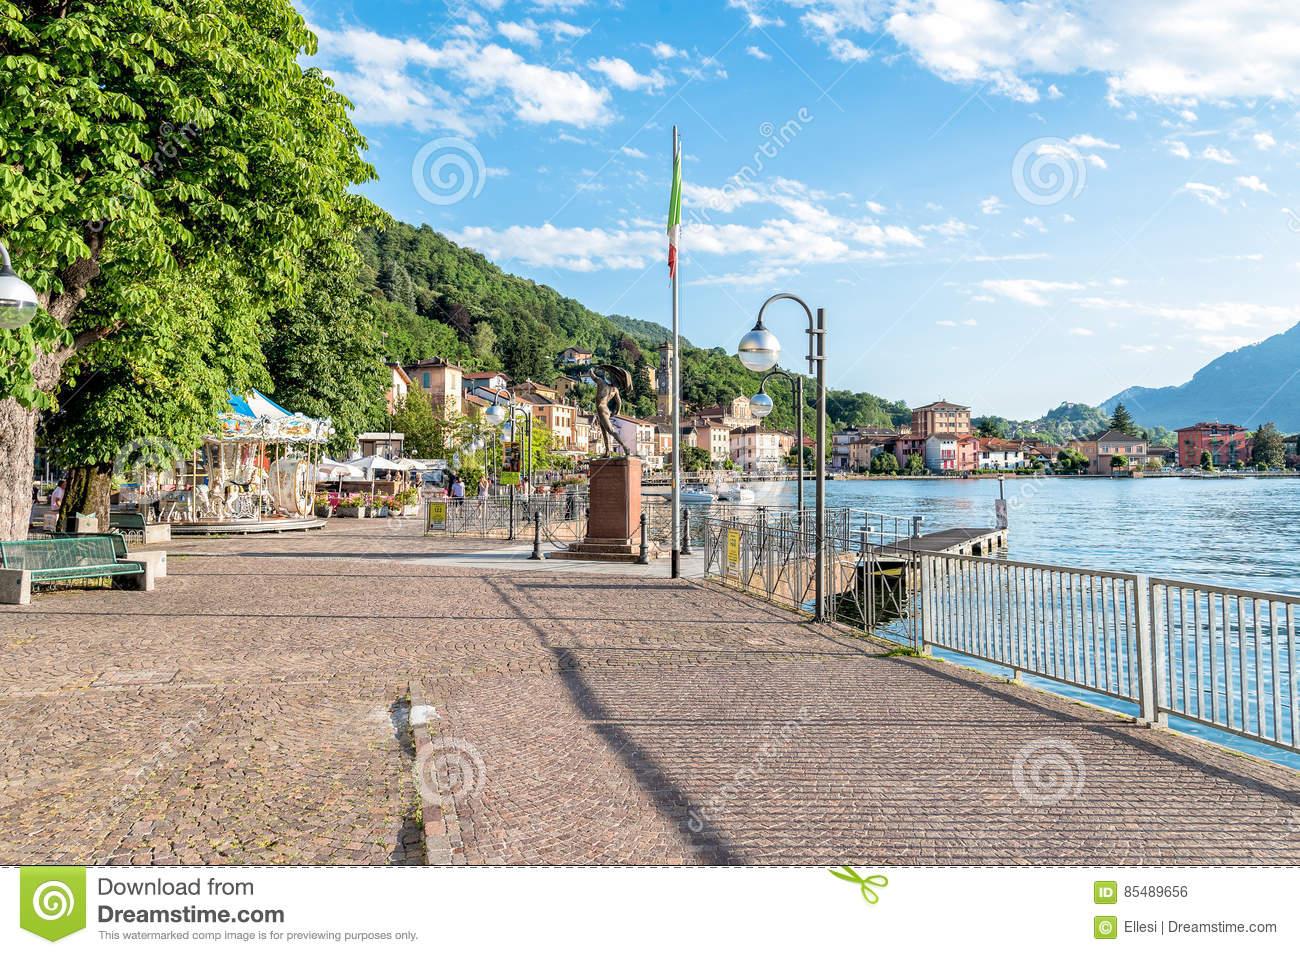 Lake Promenade Of Porto Ceresio, In The Province Of Varese On Lake.